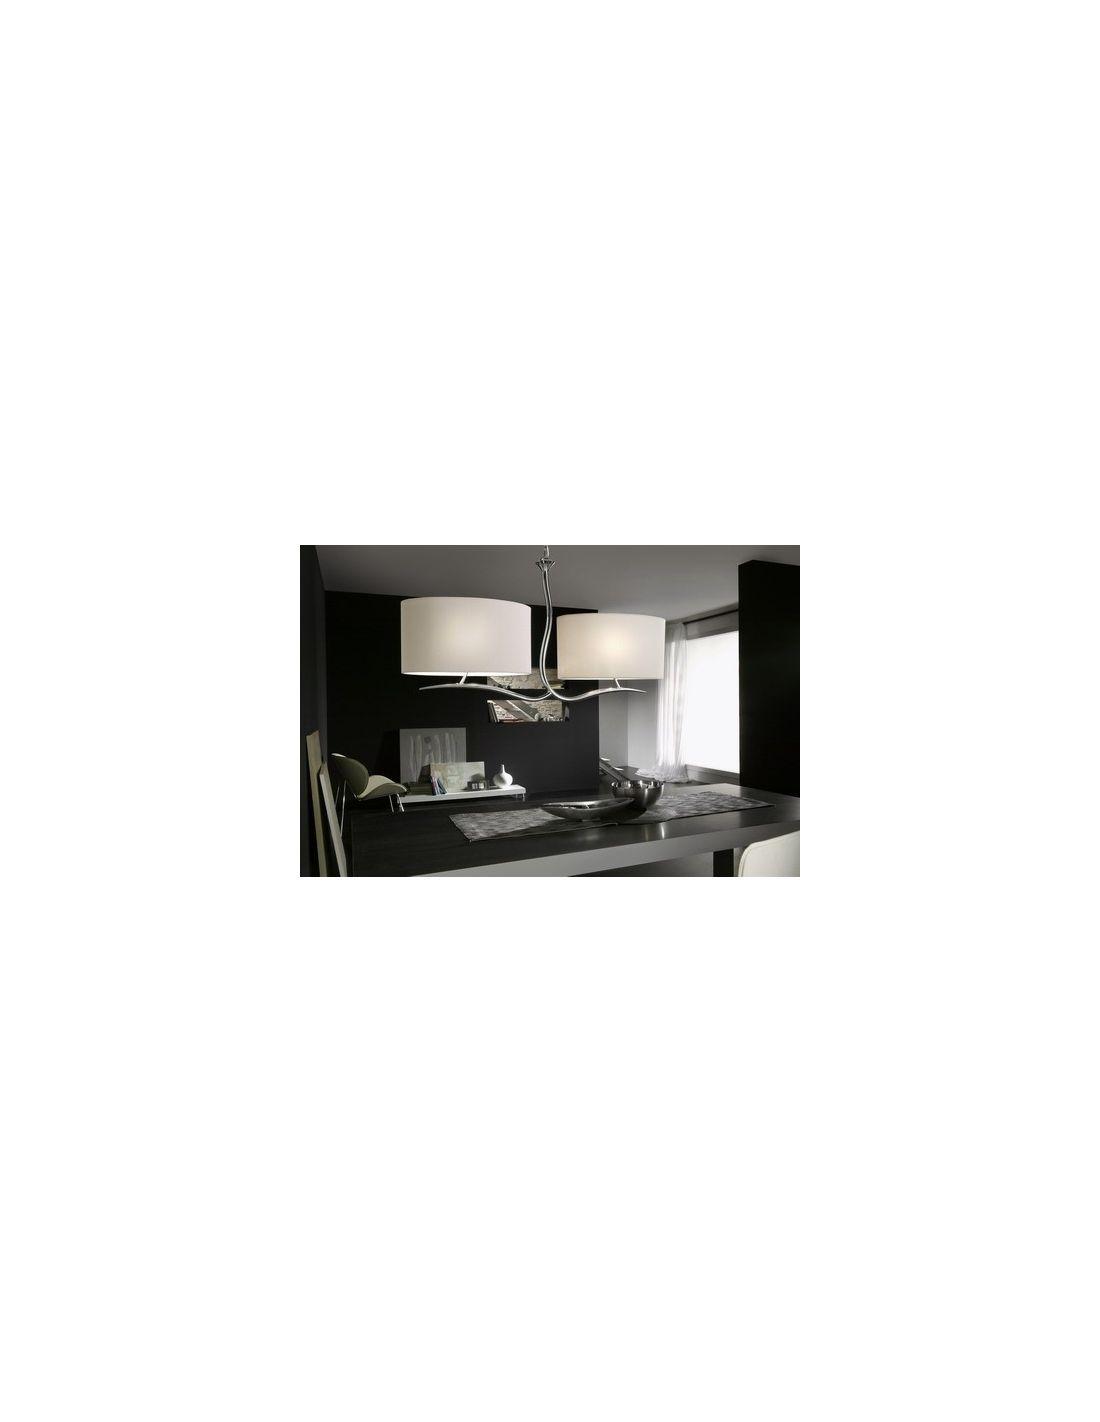 lamparas con pantallas, lamparas pantallas blanco roto, lampara ...